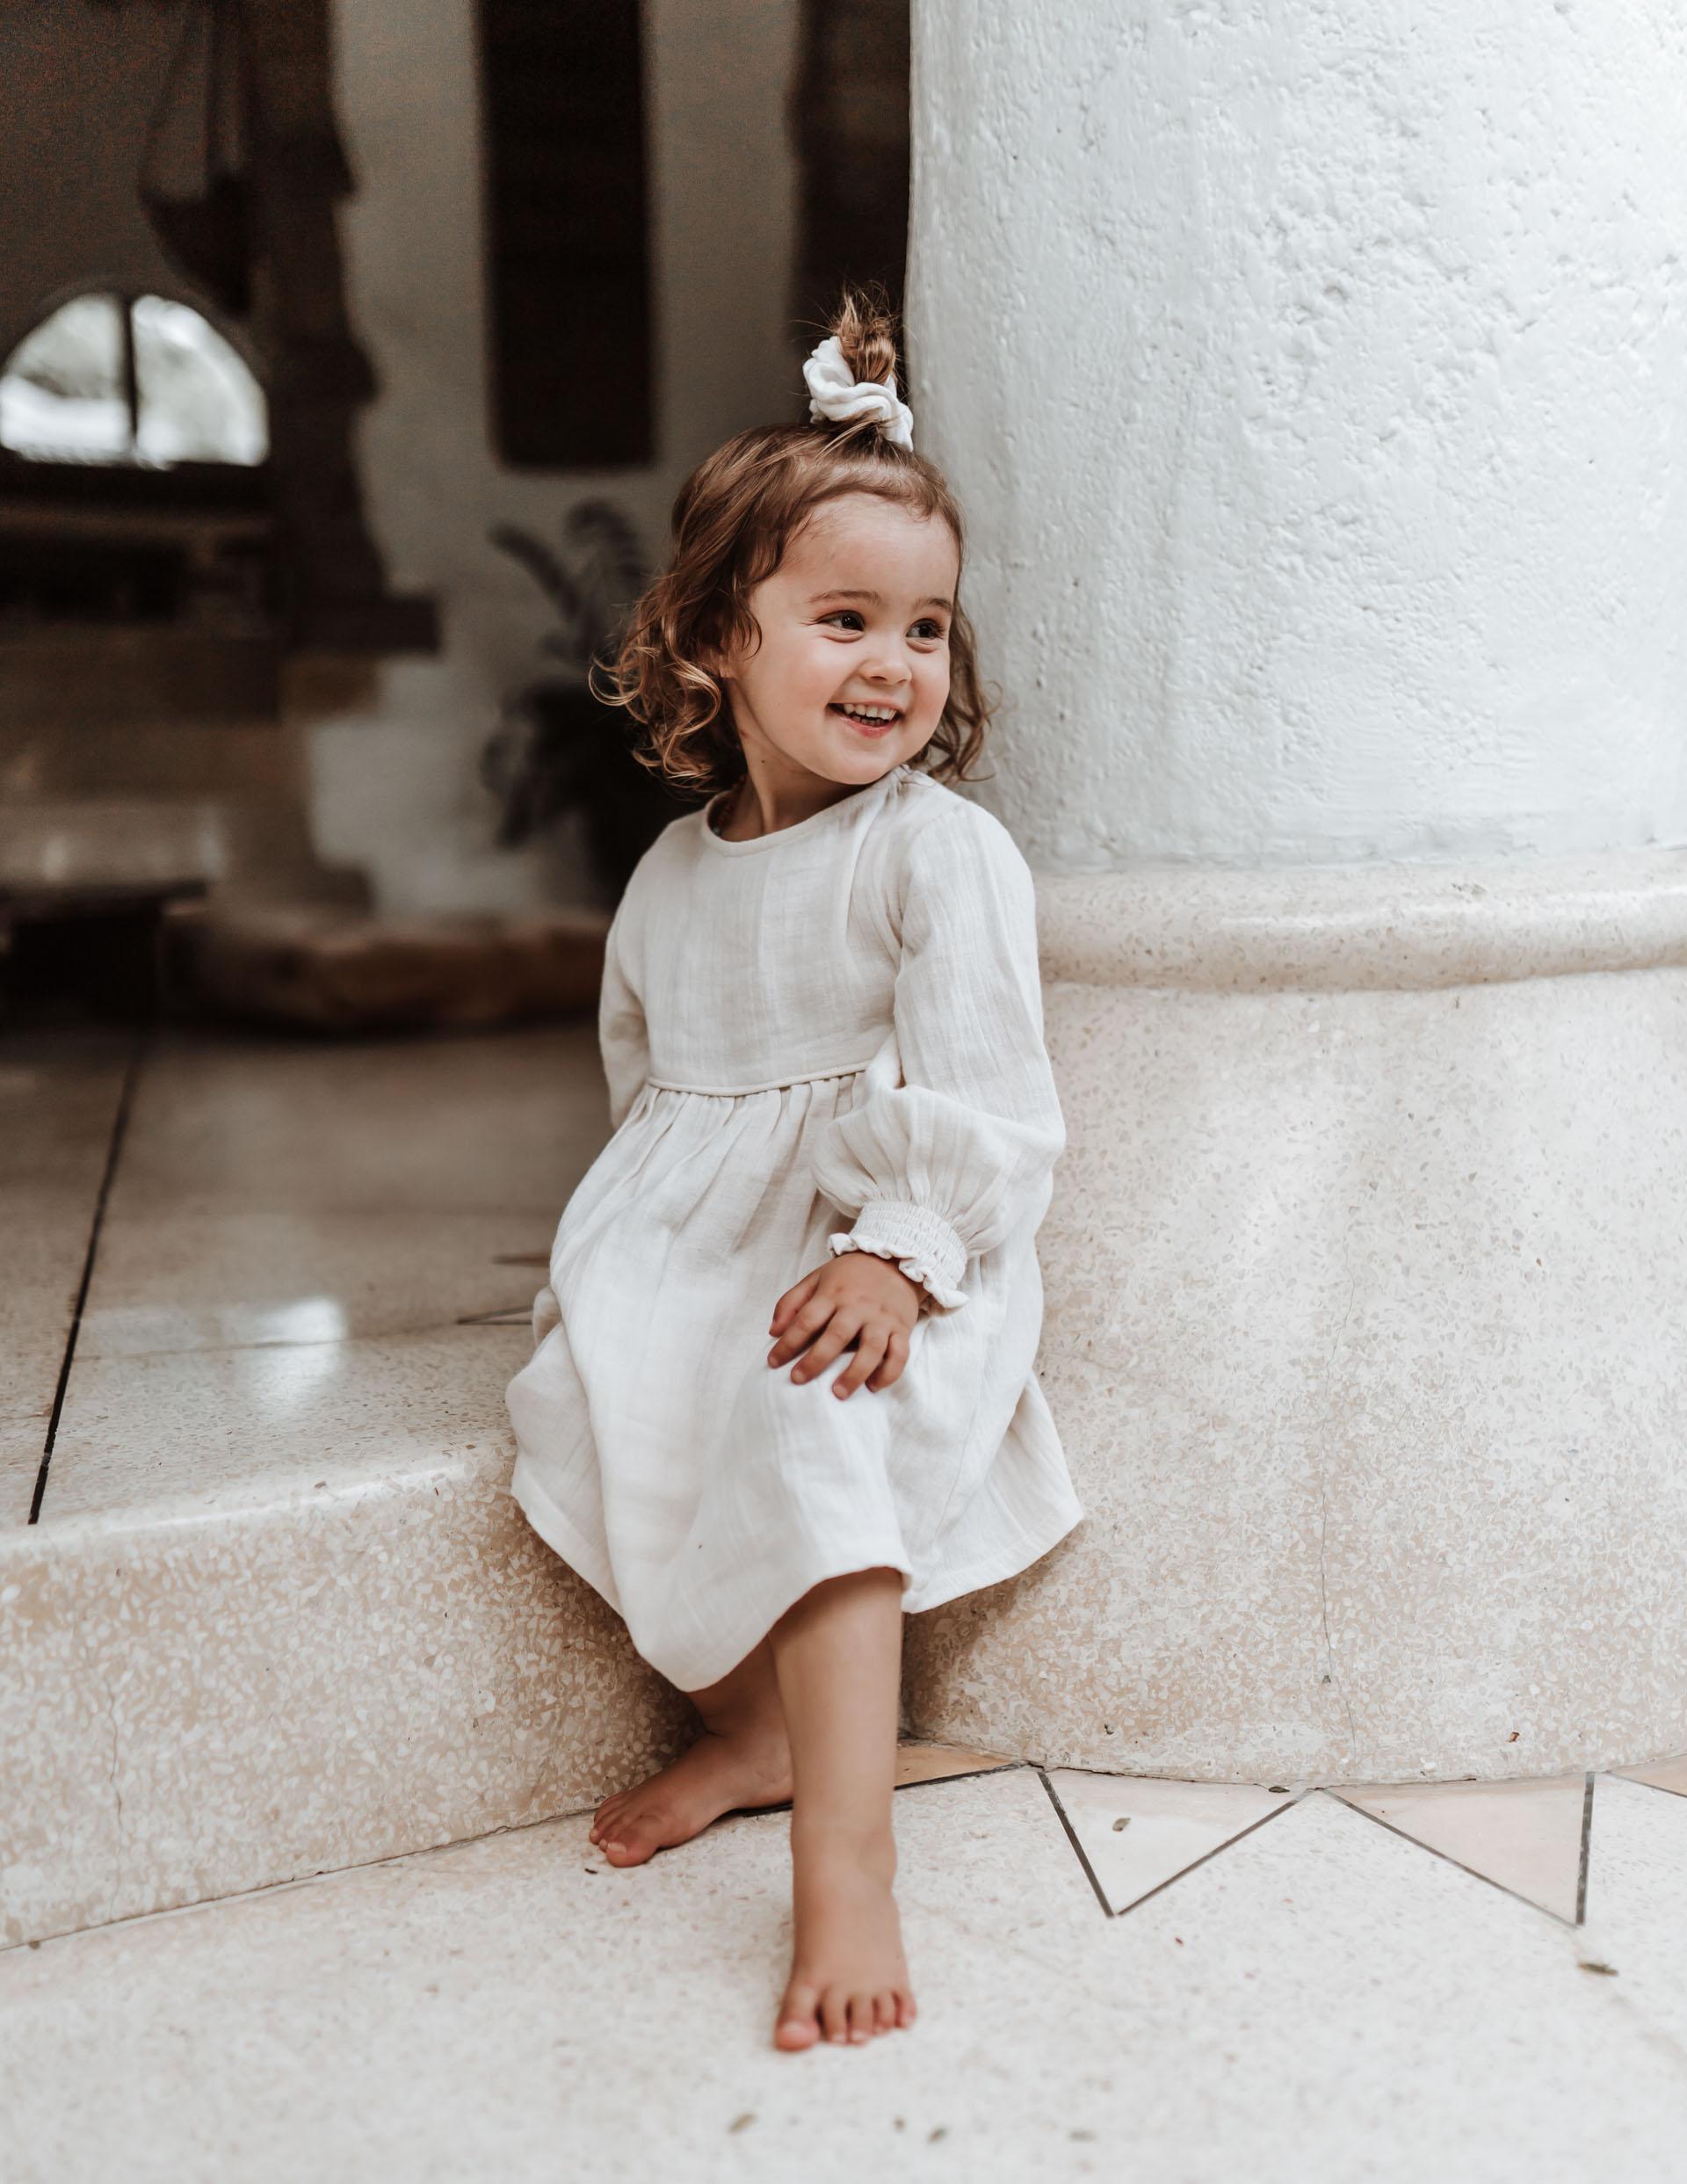 keira-mason-illoura-the-label-cute-girl-smiling.jpg